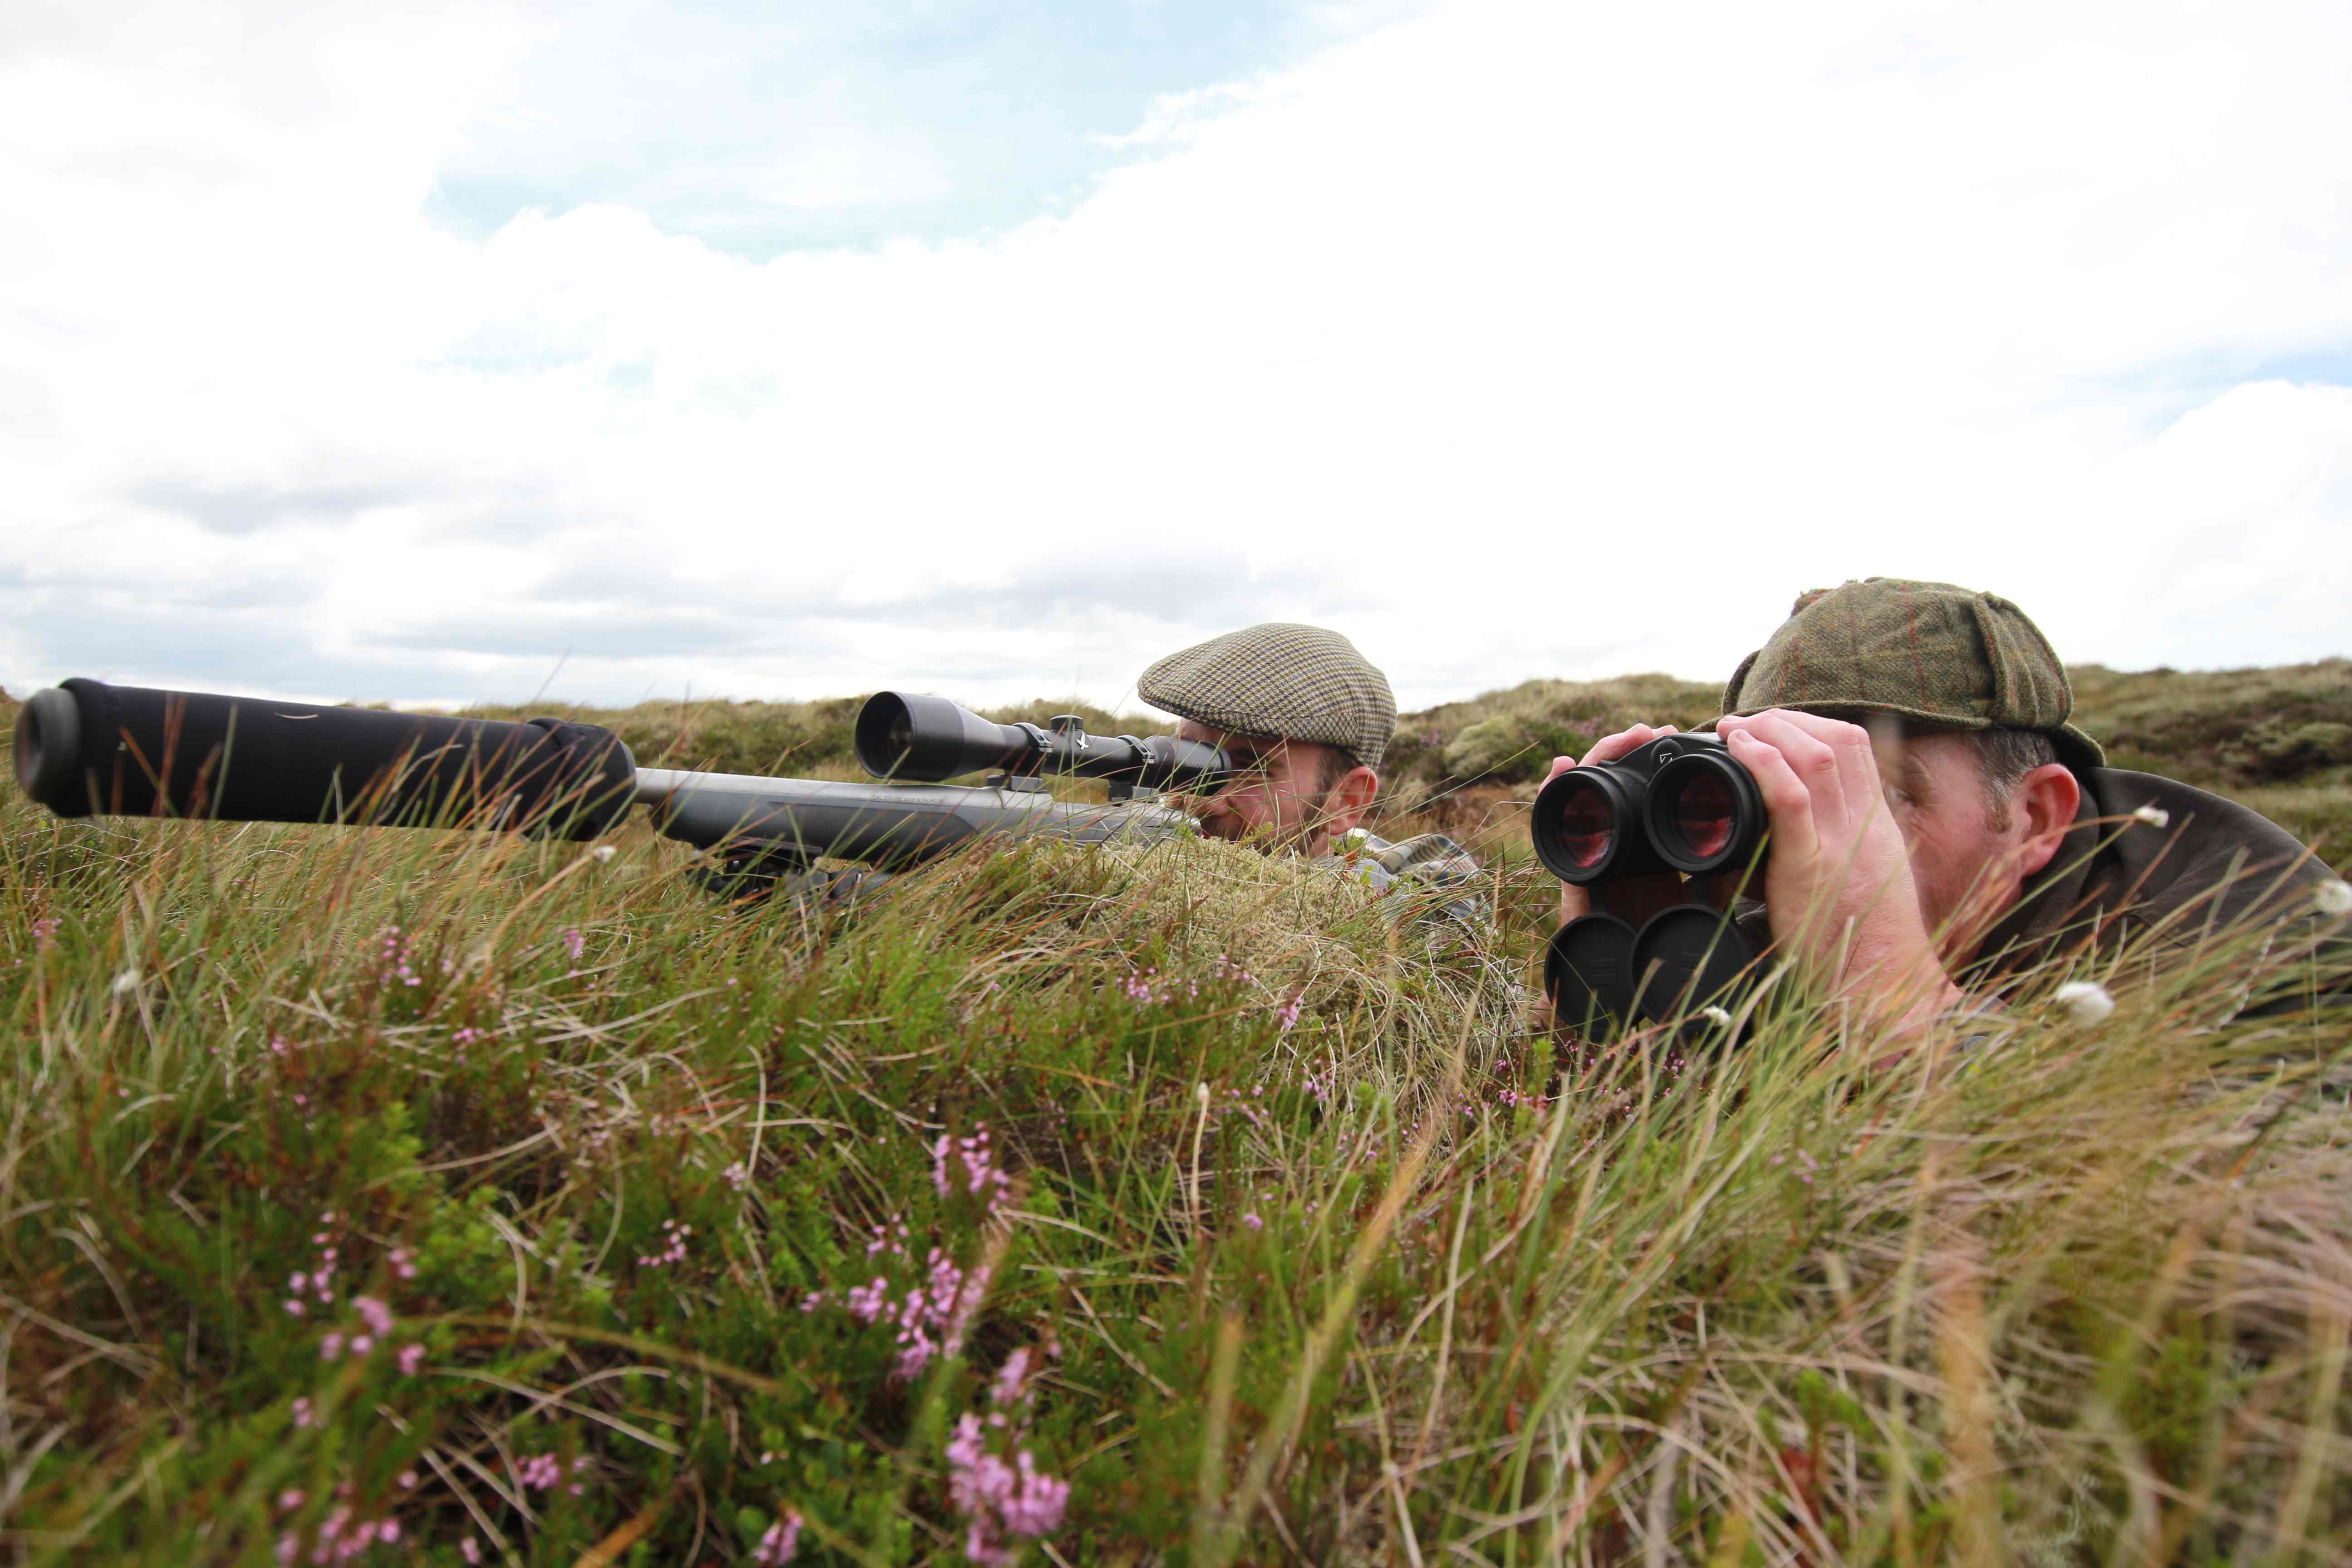 2012-08-19-Hunting.jpg